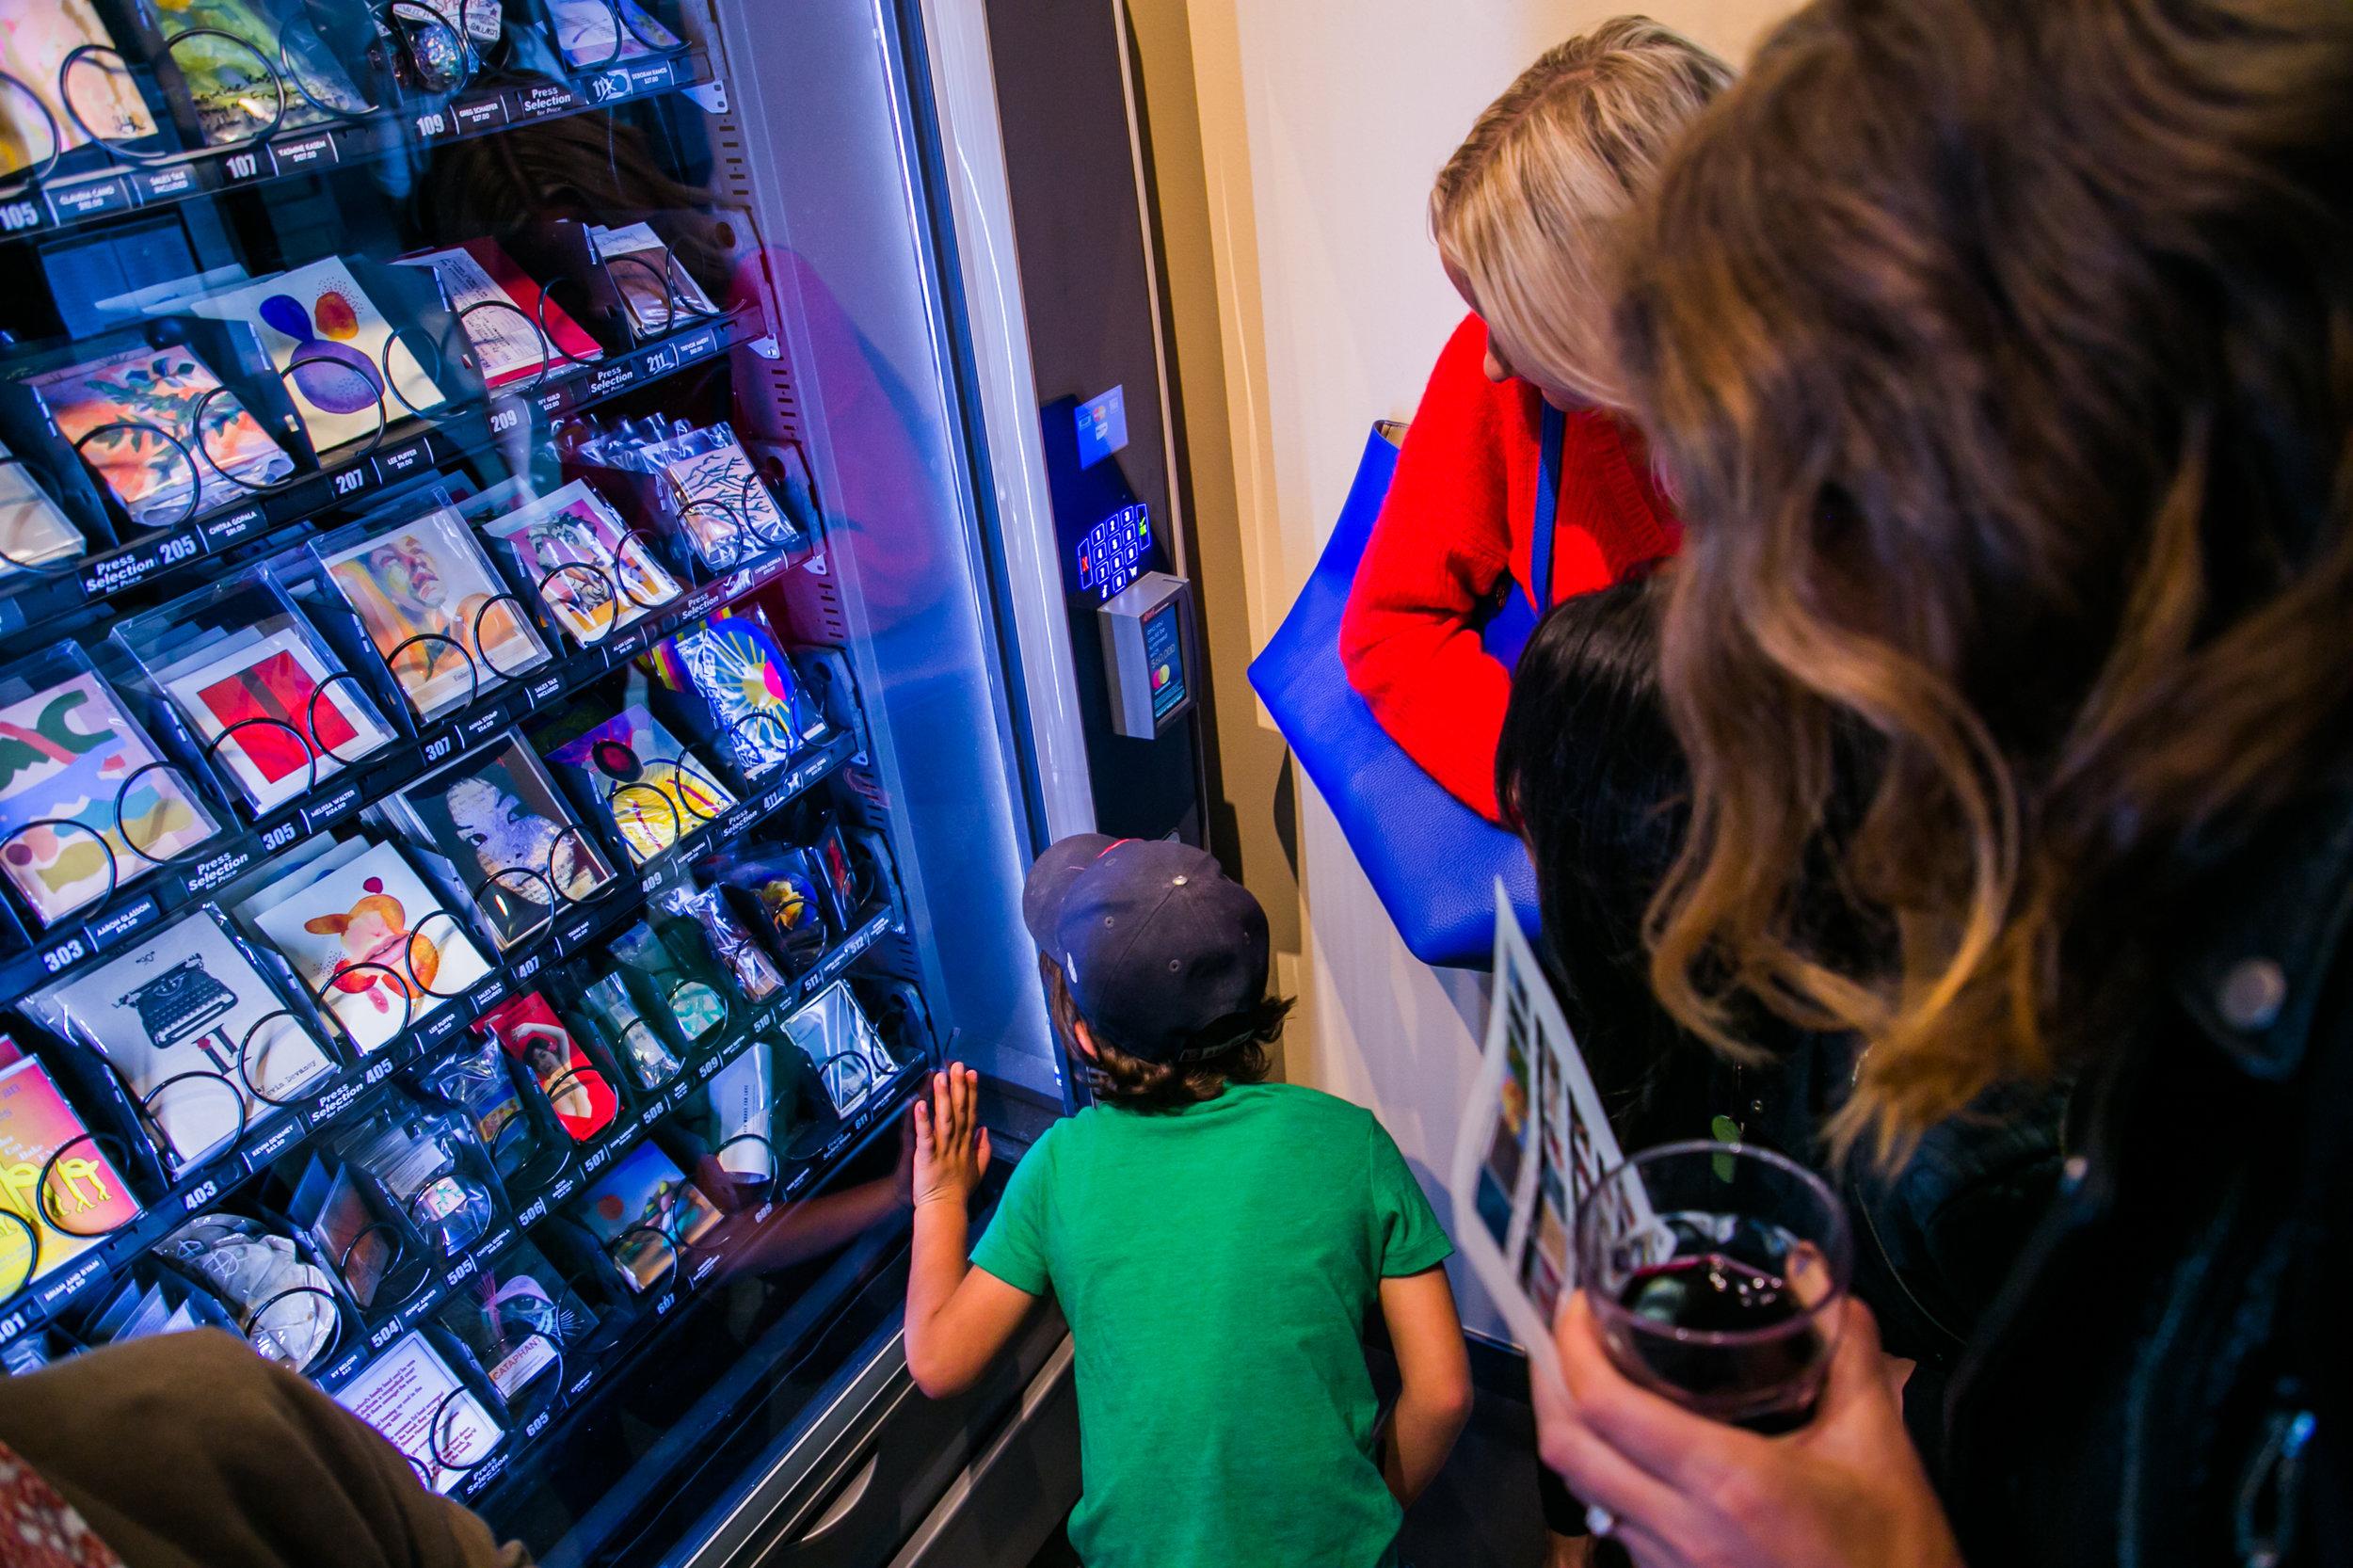 Image_VendingMachine_Reception21.jpg